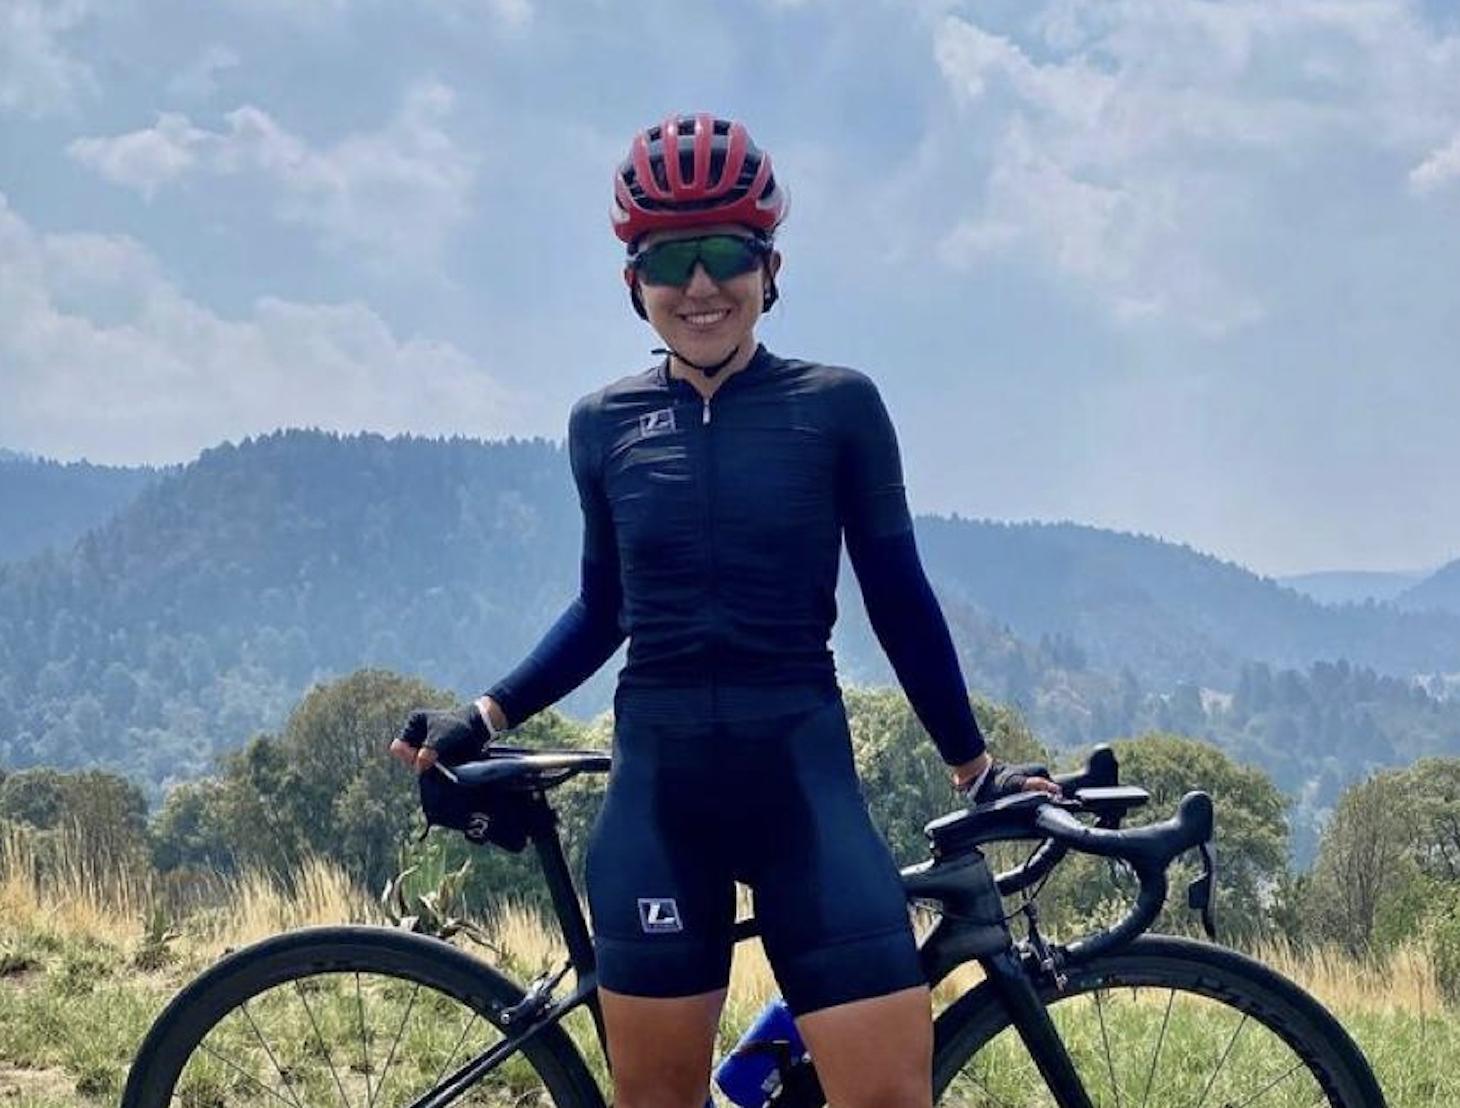 El Massi-Tactic ficha a 6 ciclistas internacionales para 2022